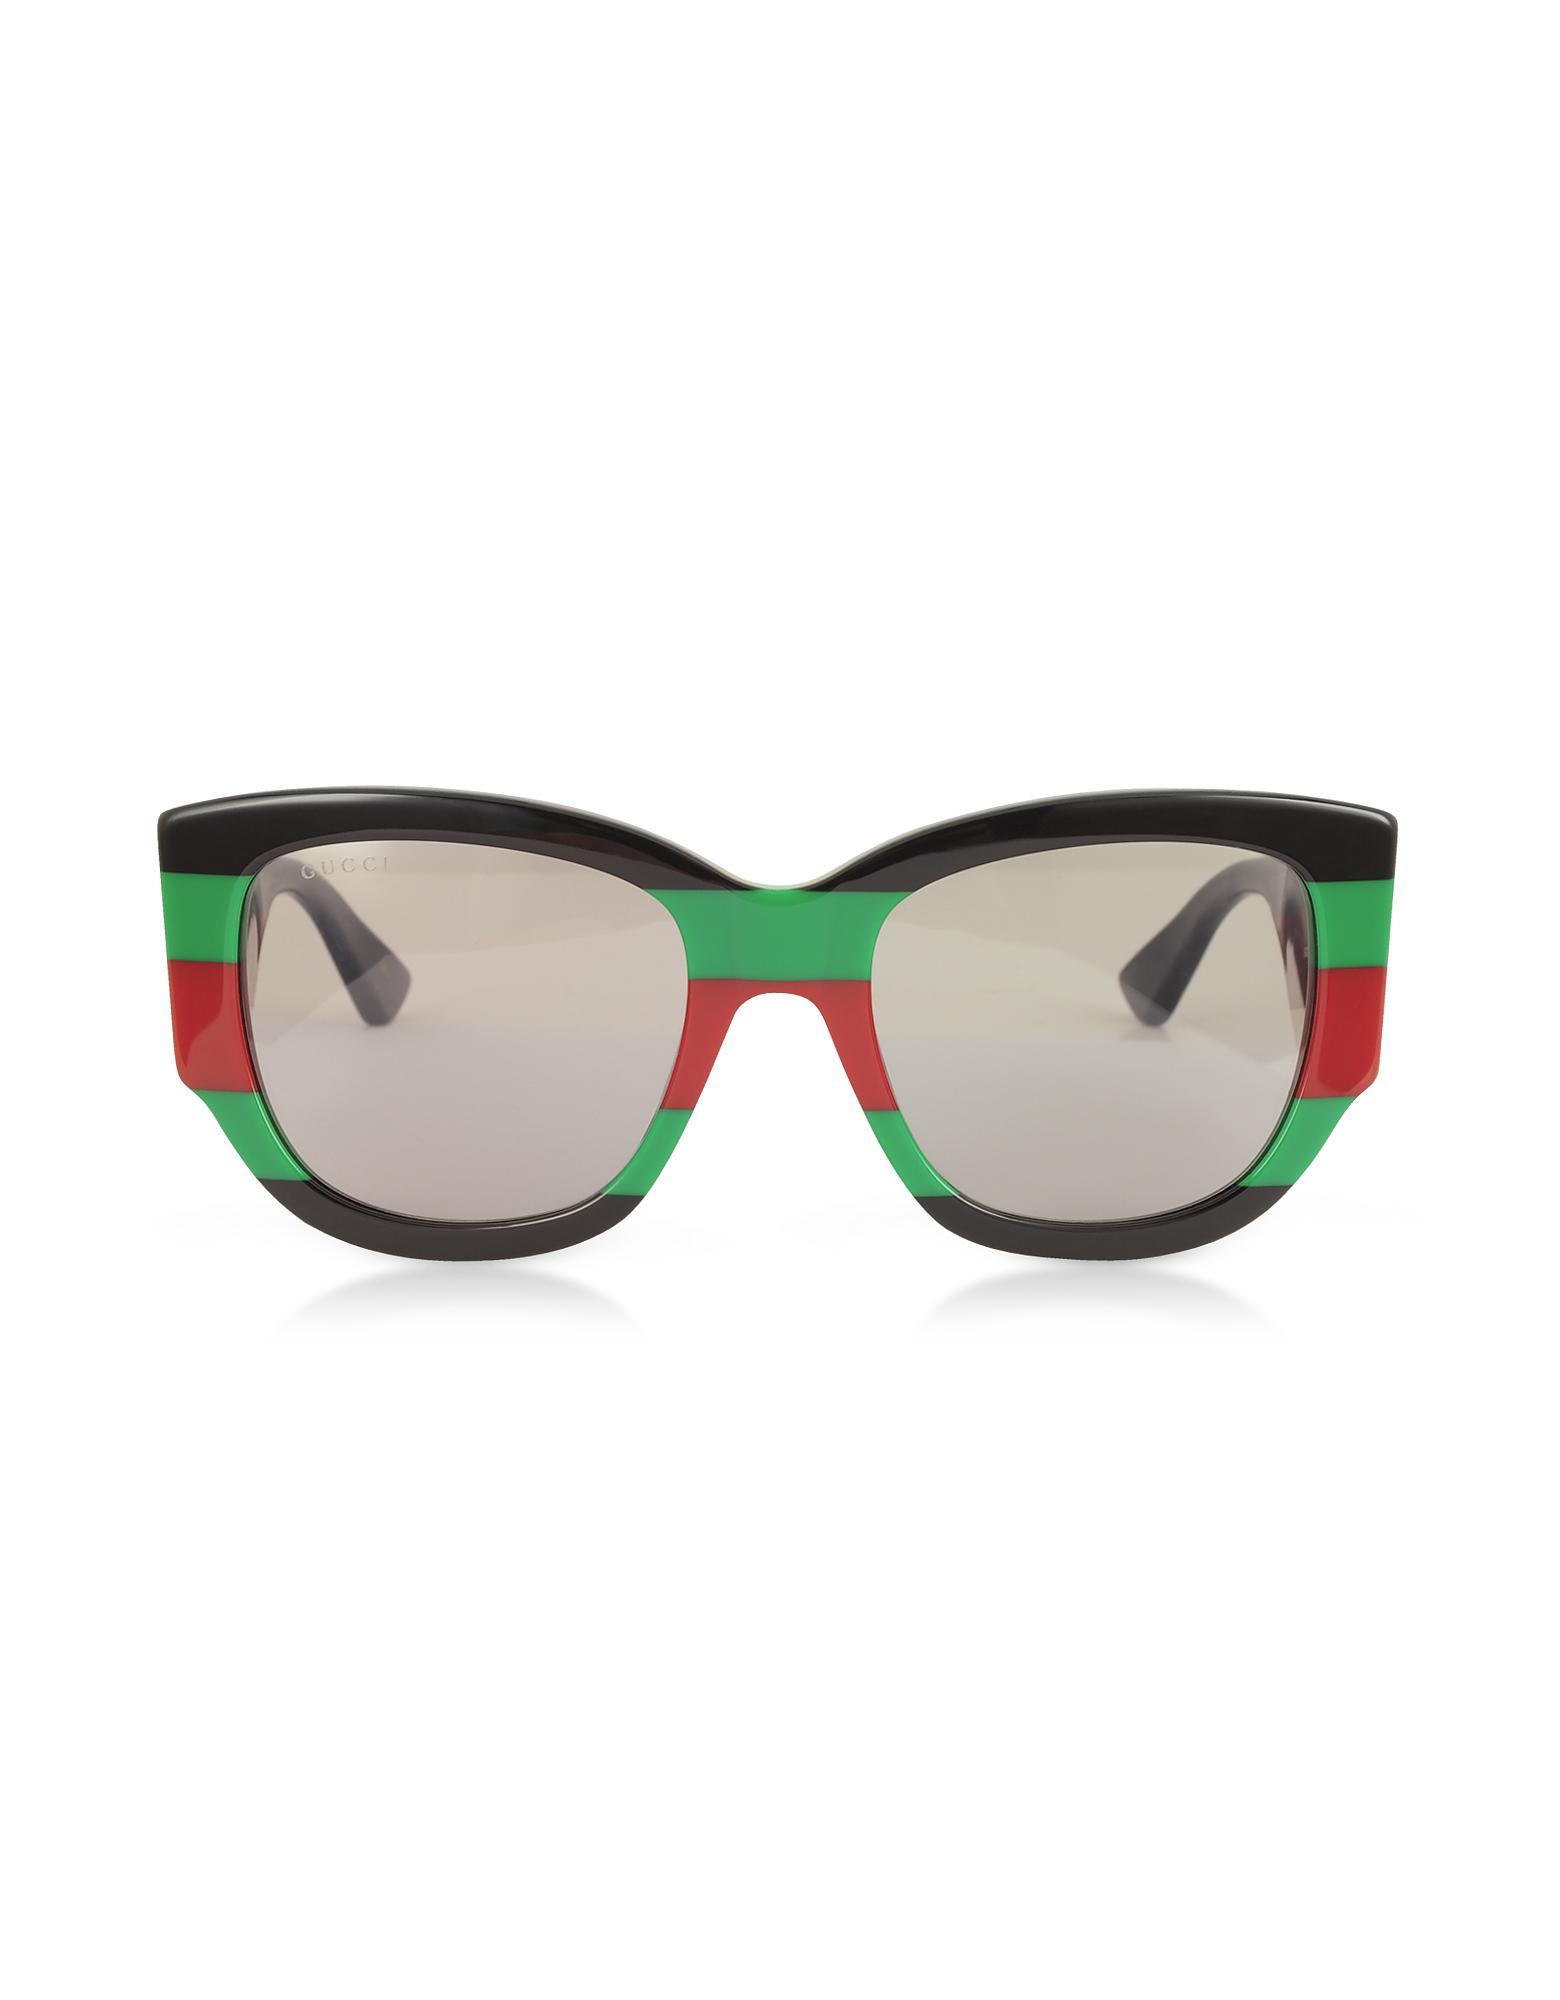 dea3a446b8e Gucci GG0276S Color Block Oversize Cat Eye Acetate Sunglassesw ...